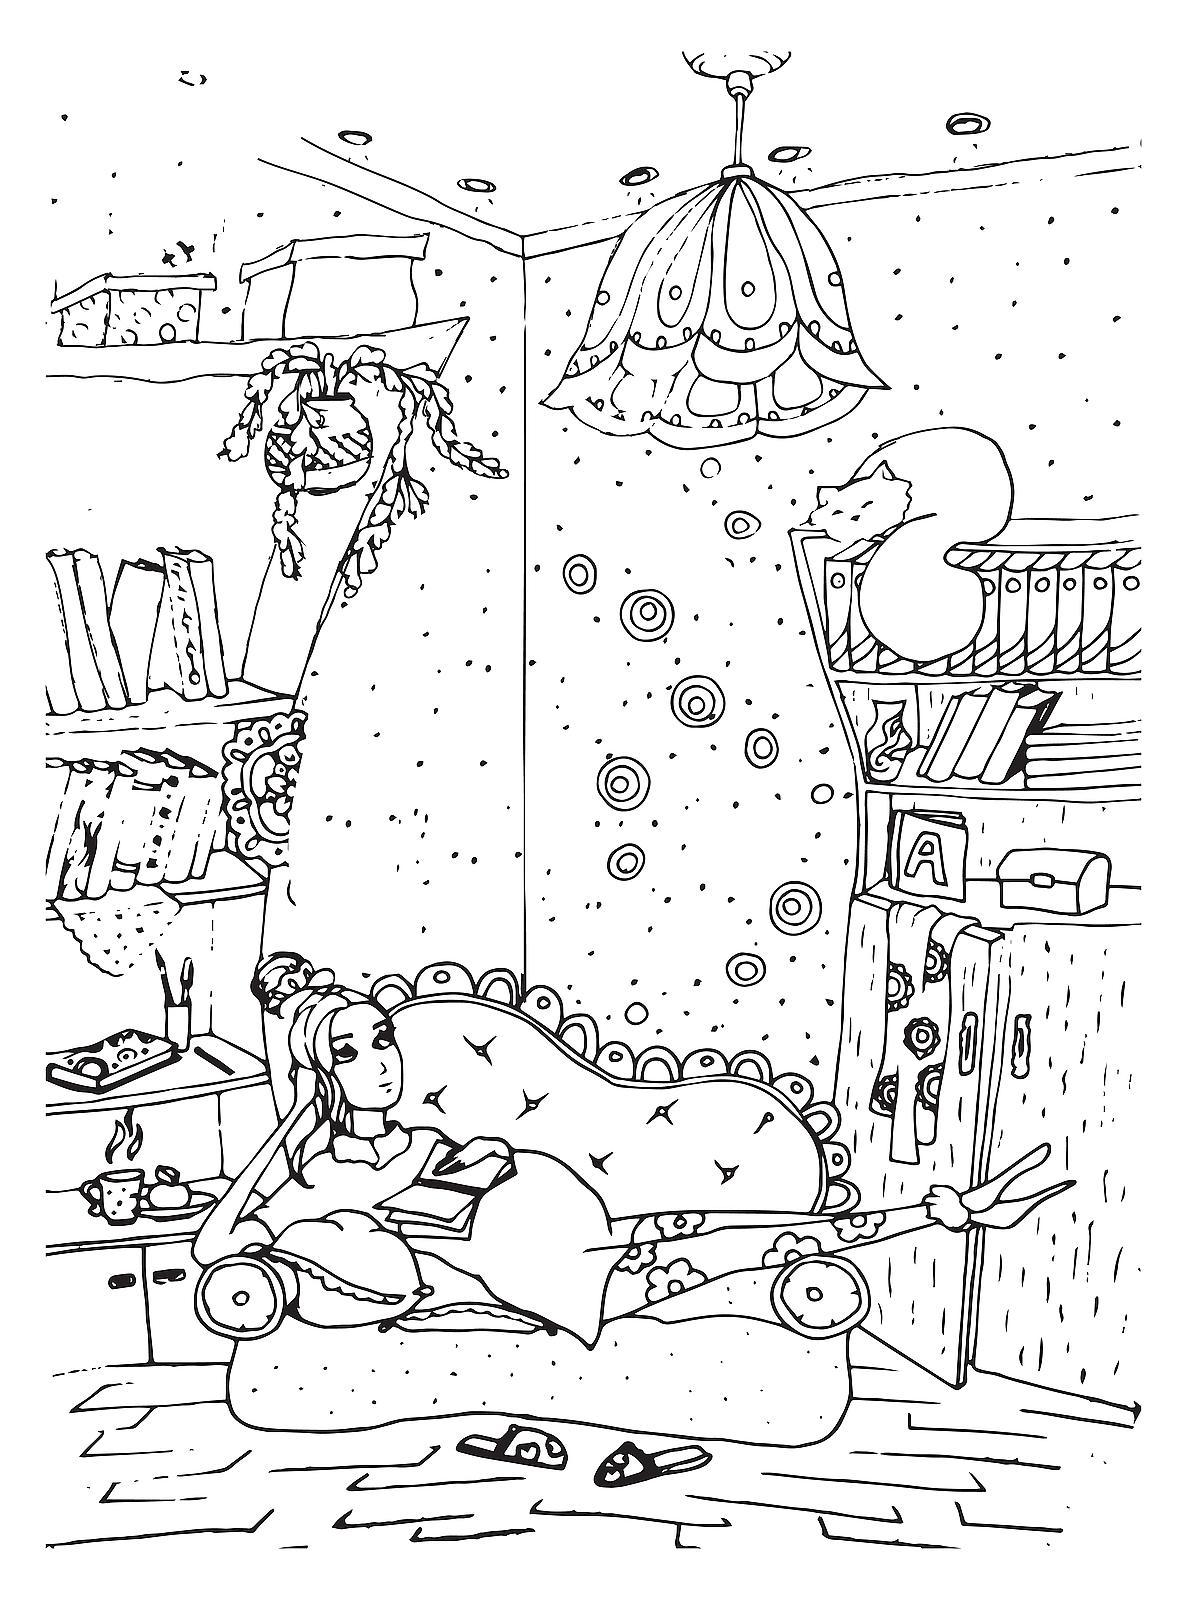 Happy pregnant woman coloring page - Coloringcrew.com | 1600x1187